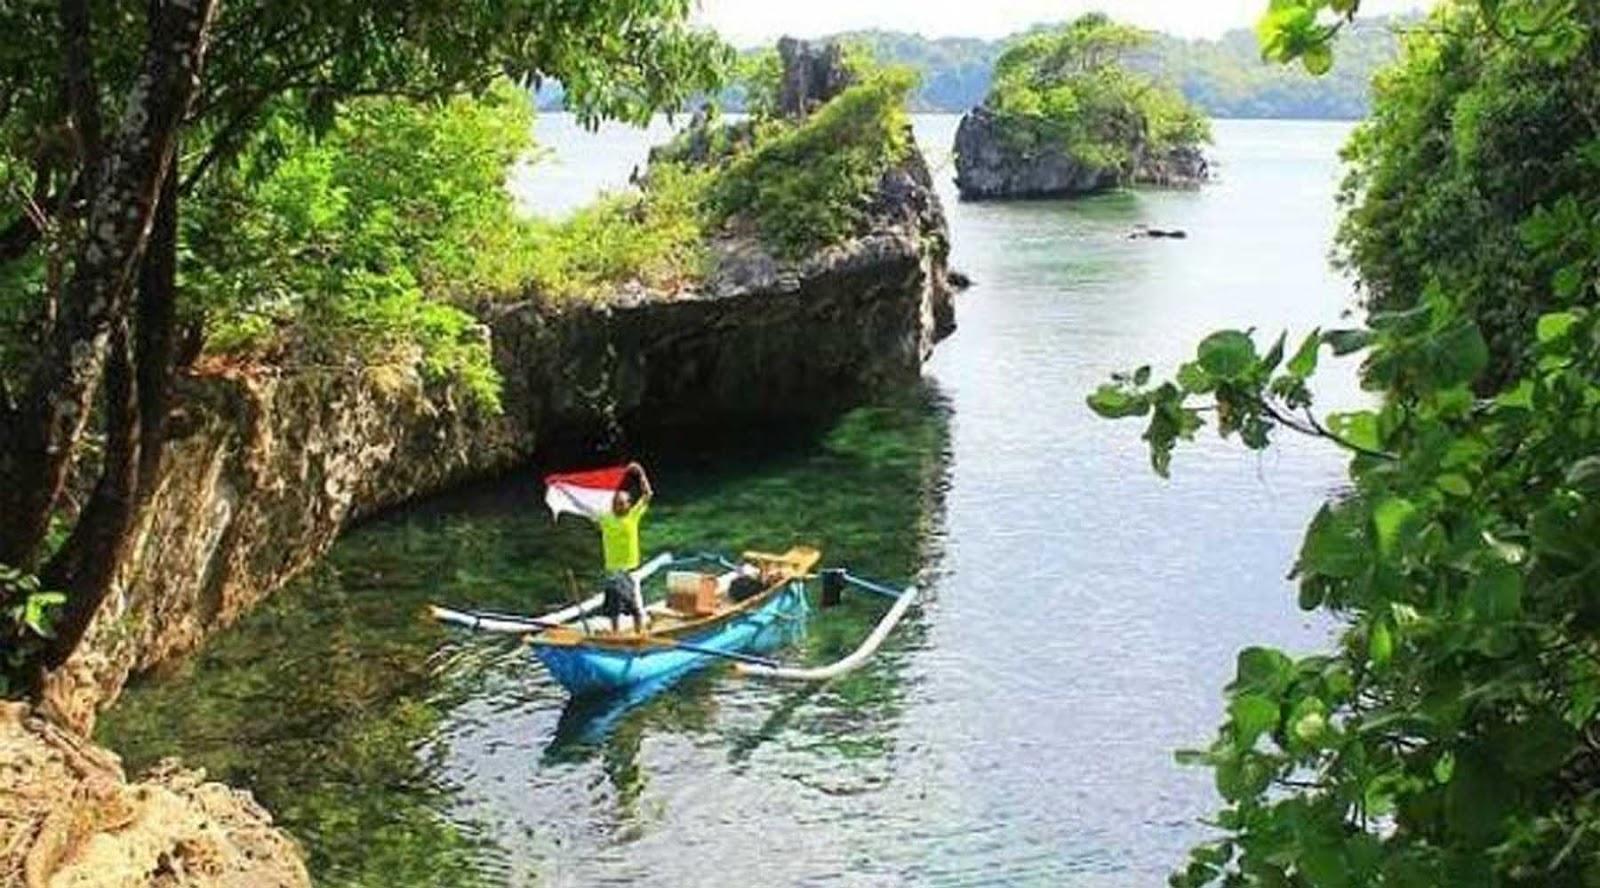 Wisata Pantai Pulau Bawean Gresik Pesona Mayangkara Kab